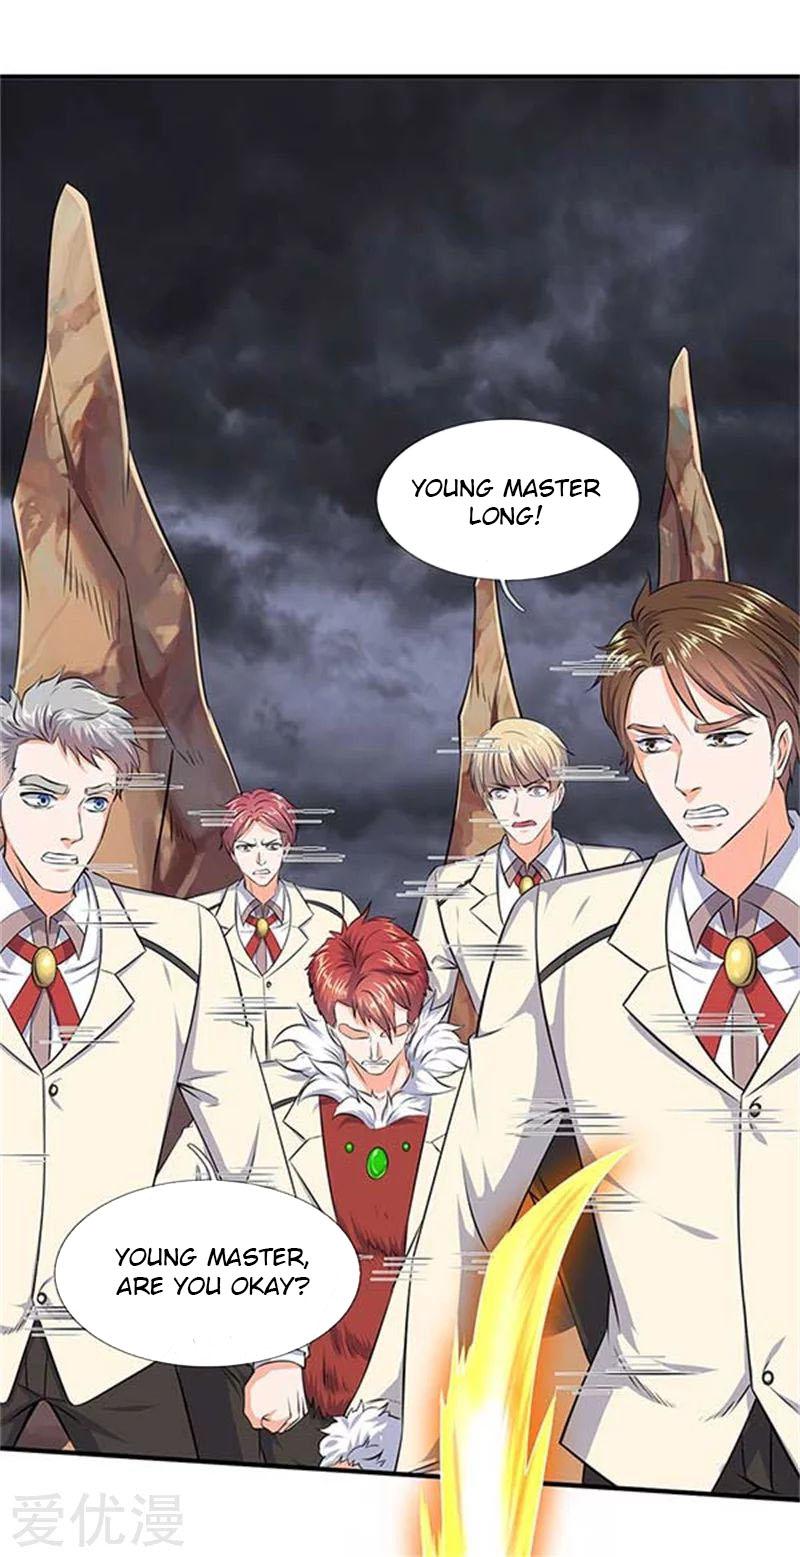 https://manga.mangadogs.com/comics/pic4/39/32615/1586324/753216792f4531dcbbb7d51e8464a431.jpg Page 1